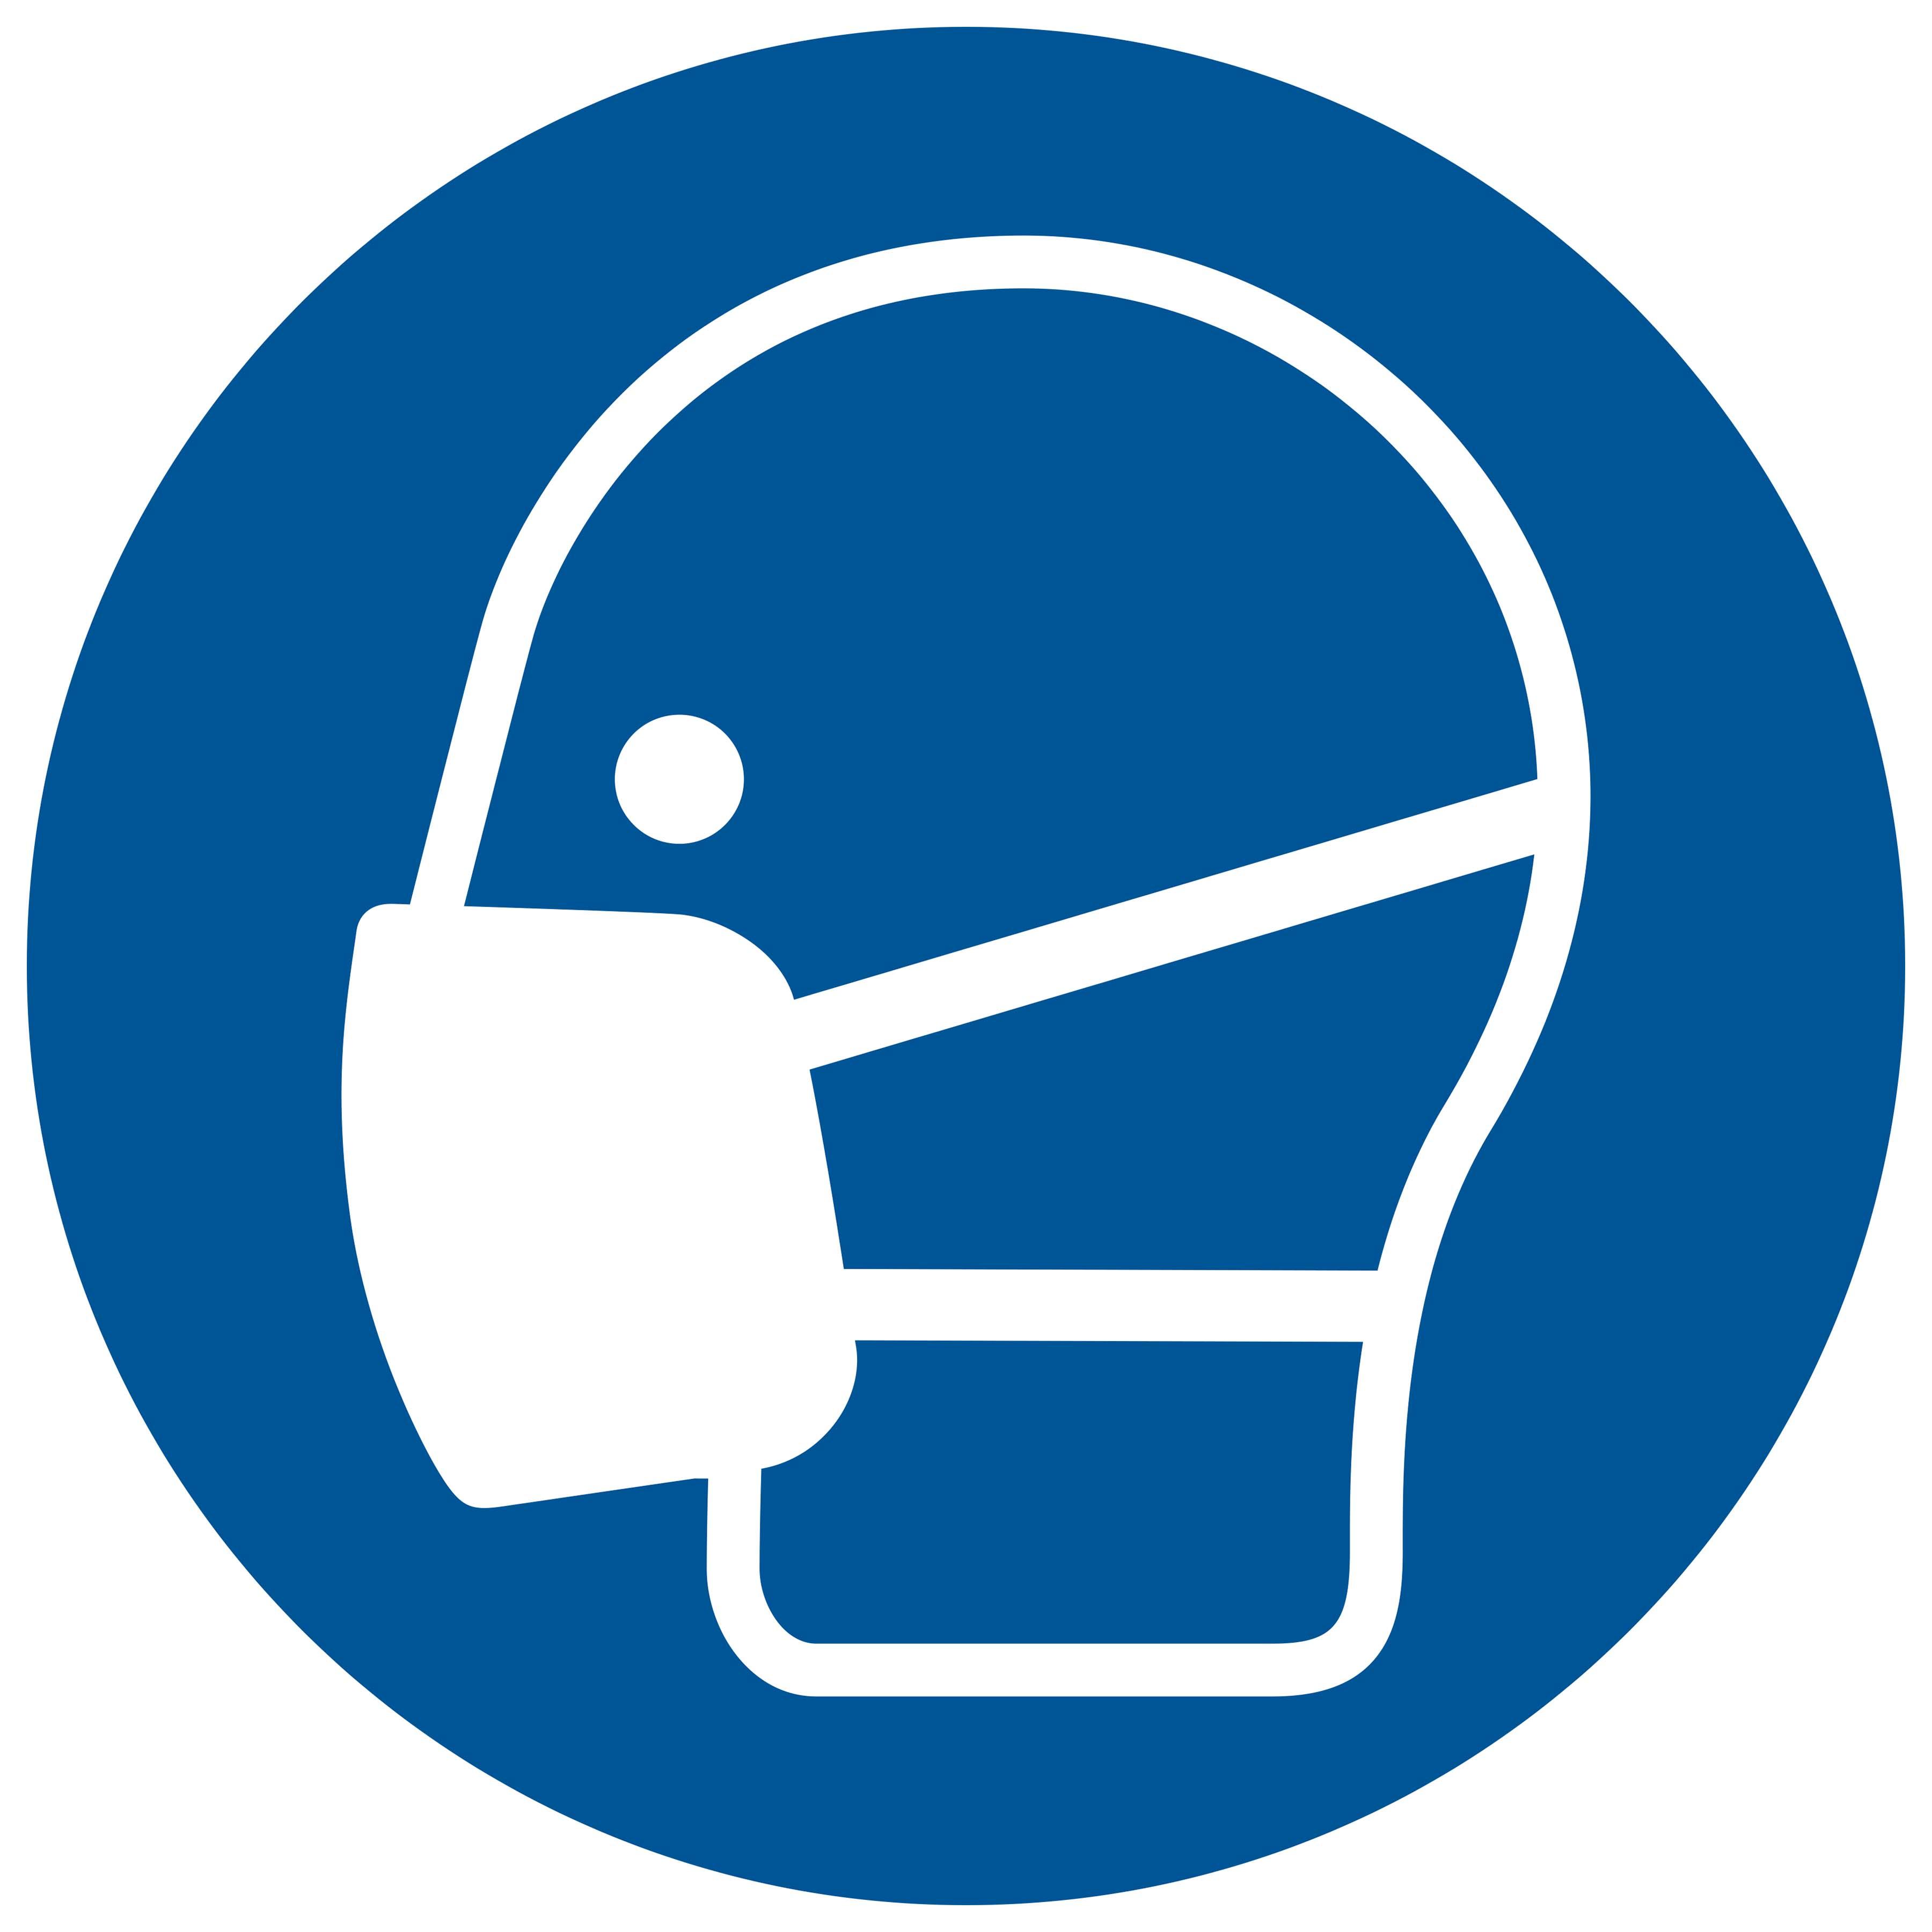 Bord Mondkapje dragen verplicht - wearing a face mask is mandatory - le port d'un masque facial est obligatoire - Das Tragen einer Gesichtsmaske ist obligatorisch - social distance COVID19 COVID-19 corona virus